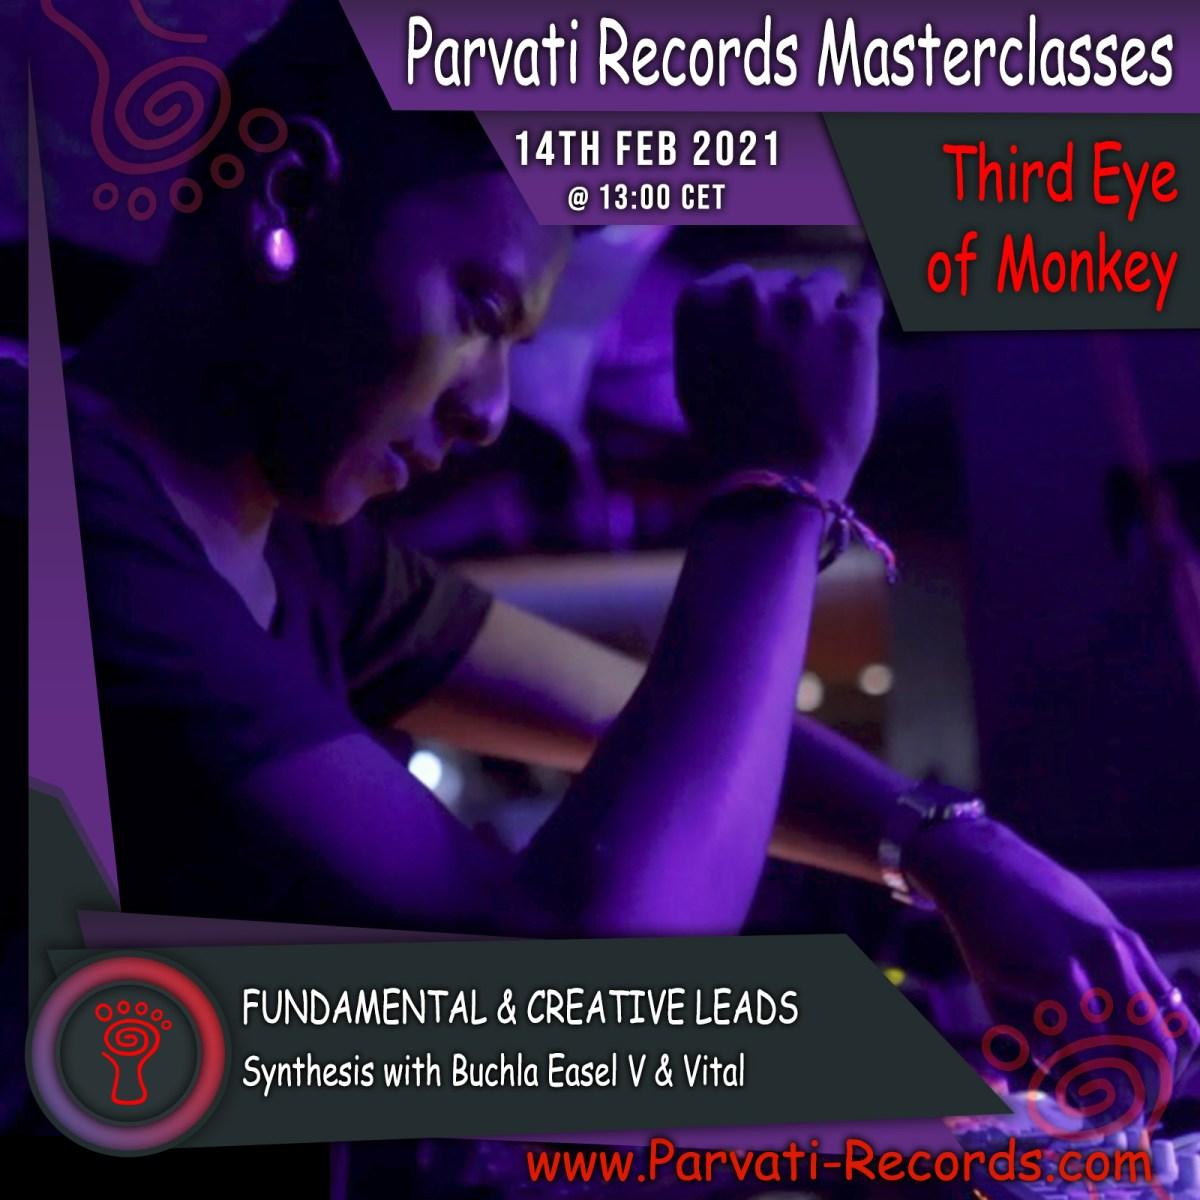 Parvati Records Masterclass: Third Eye of Monkey